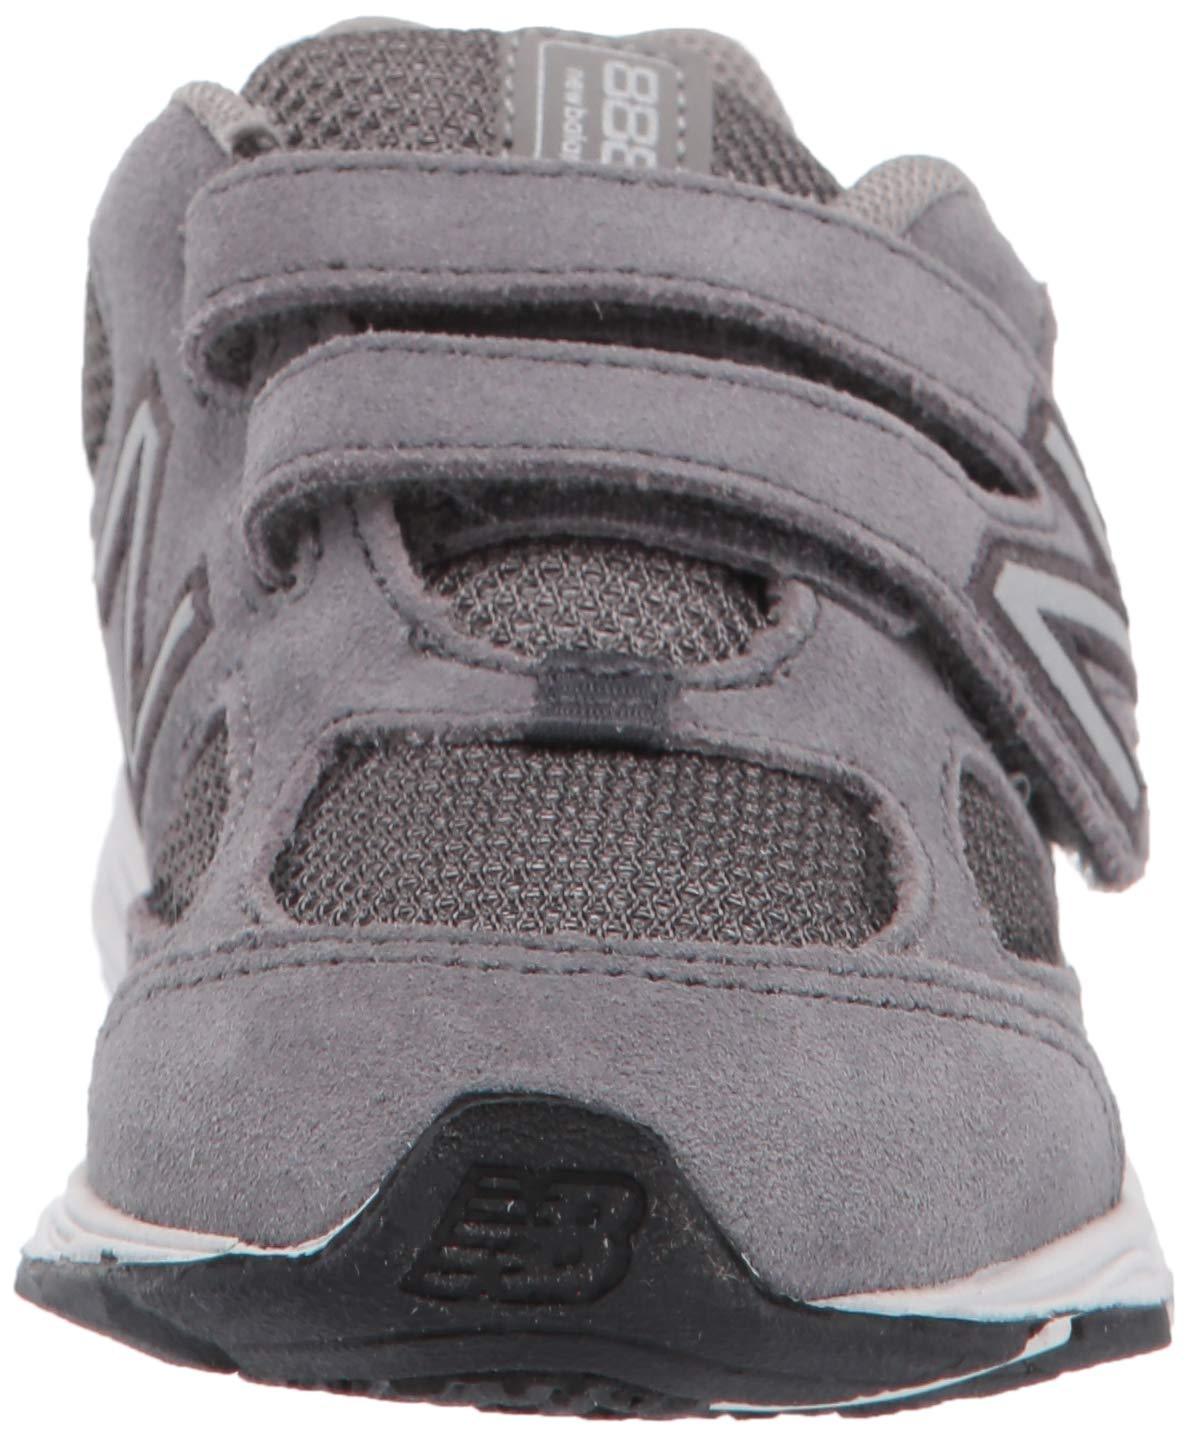 New Balance Boys' 888v2 Hook and Loop Running Shoe, Dark Grey, 2 M US Infant by New Balance (Image #4)